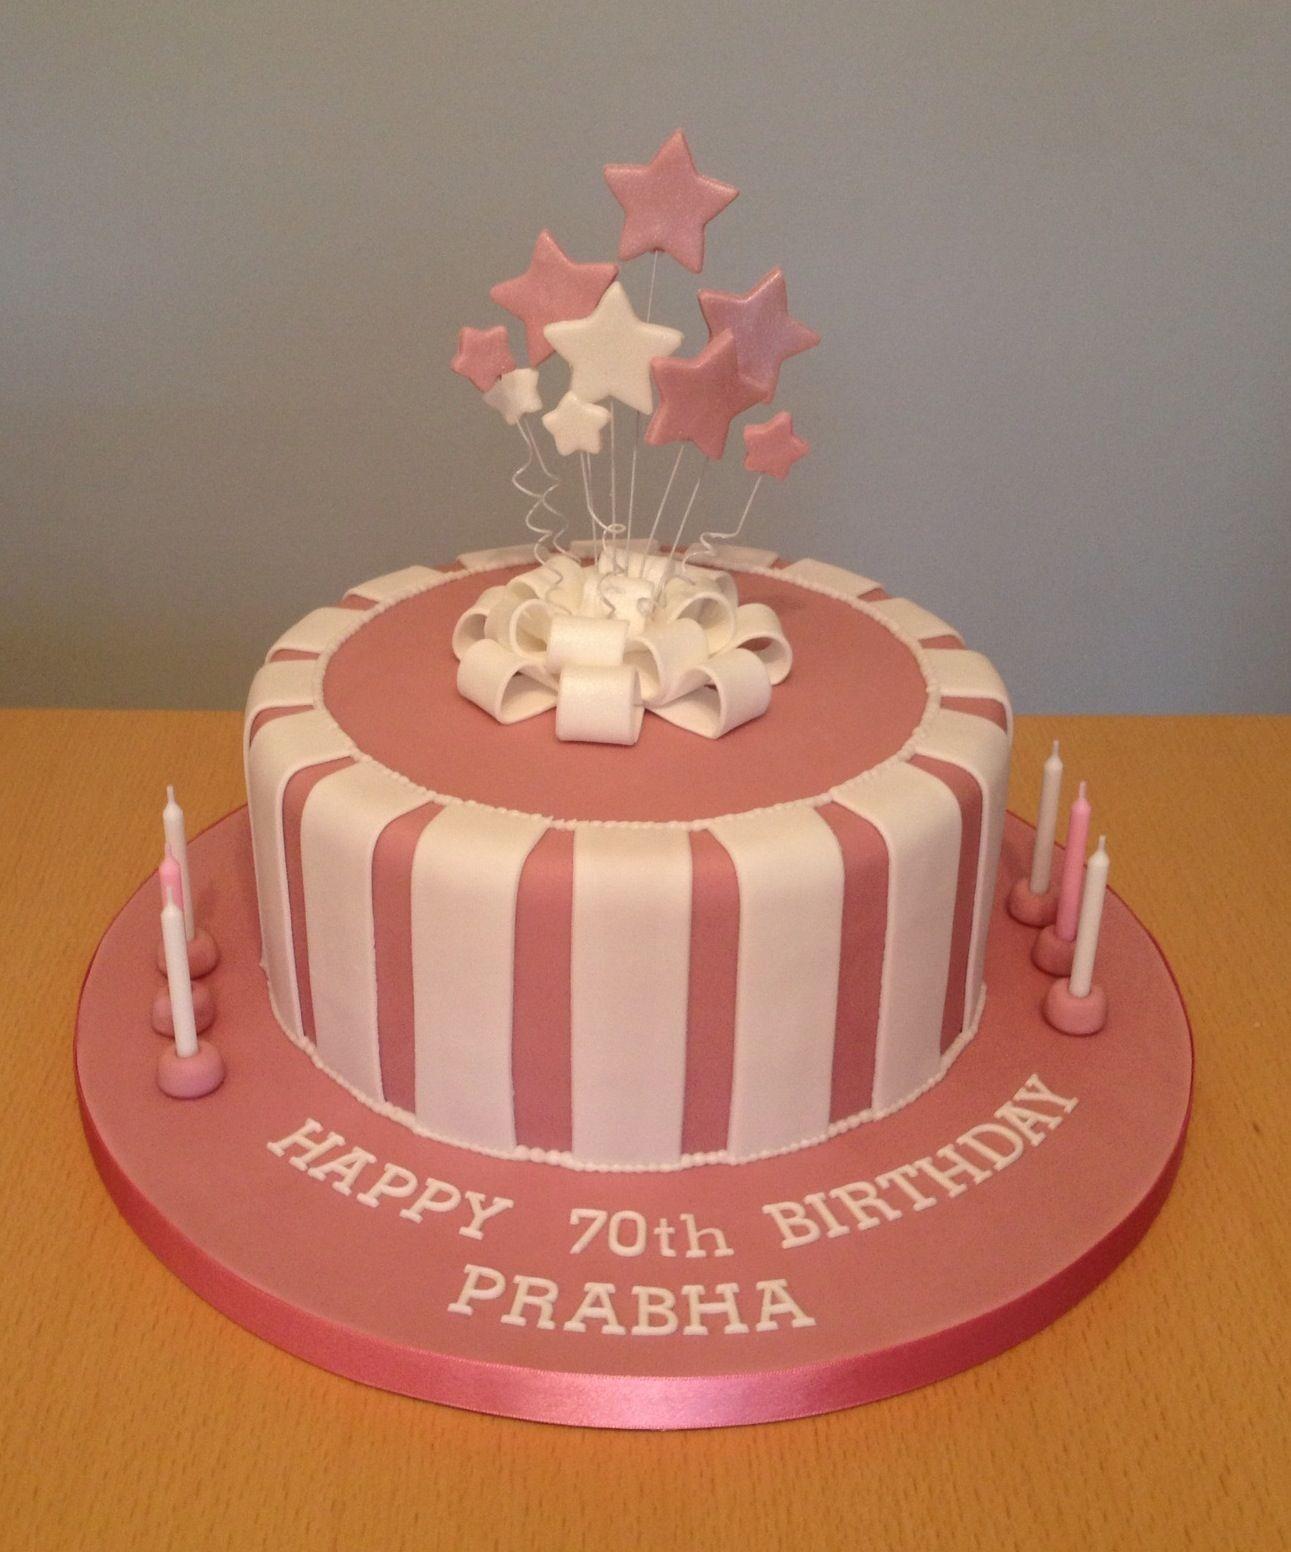 70th birthday cakes cake decorating ideas pinterest for 70th birthday cake decoration ideas